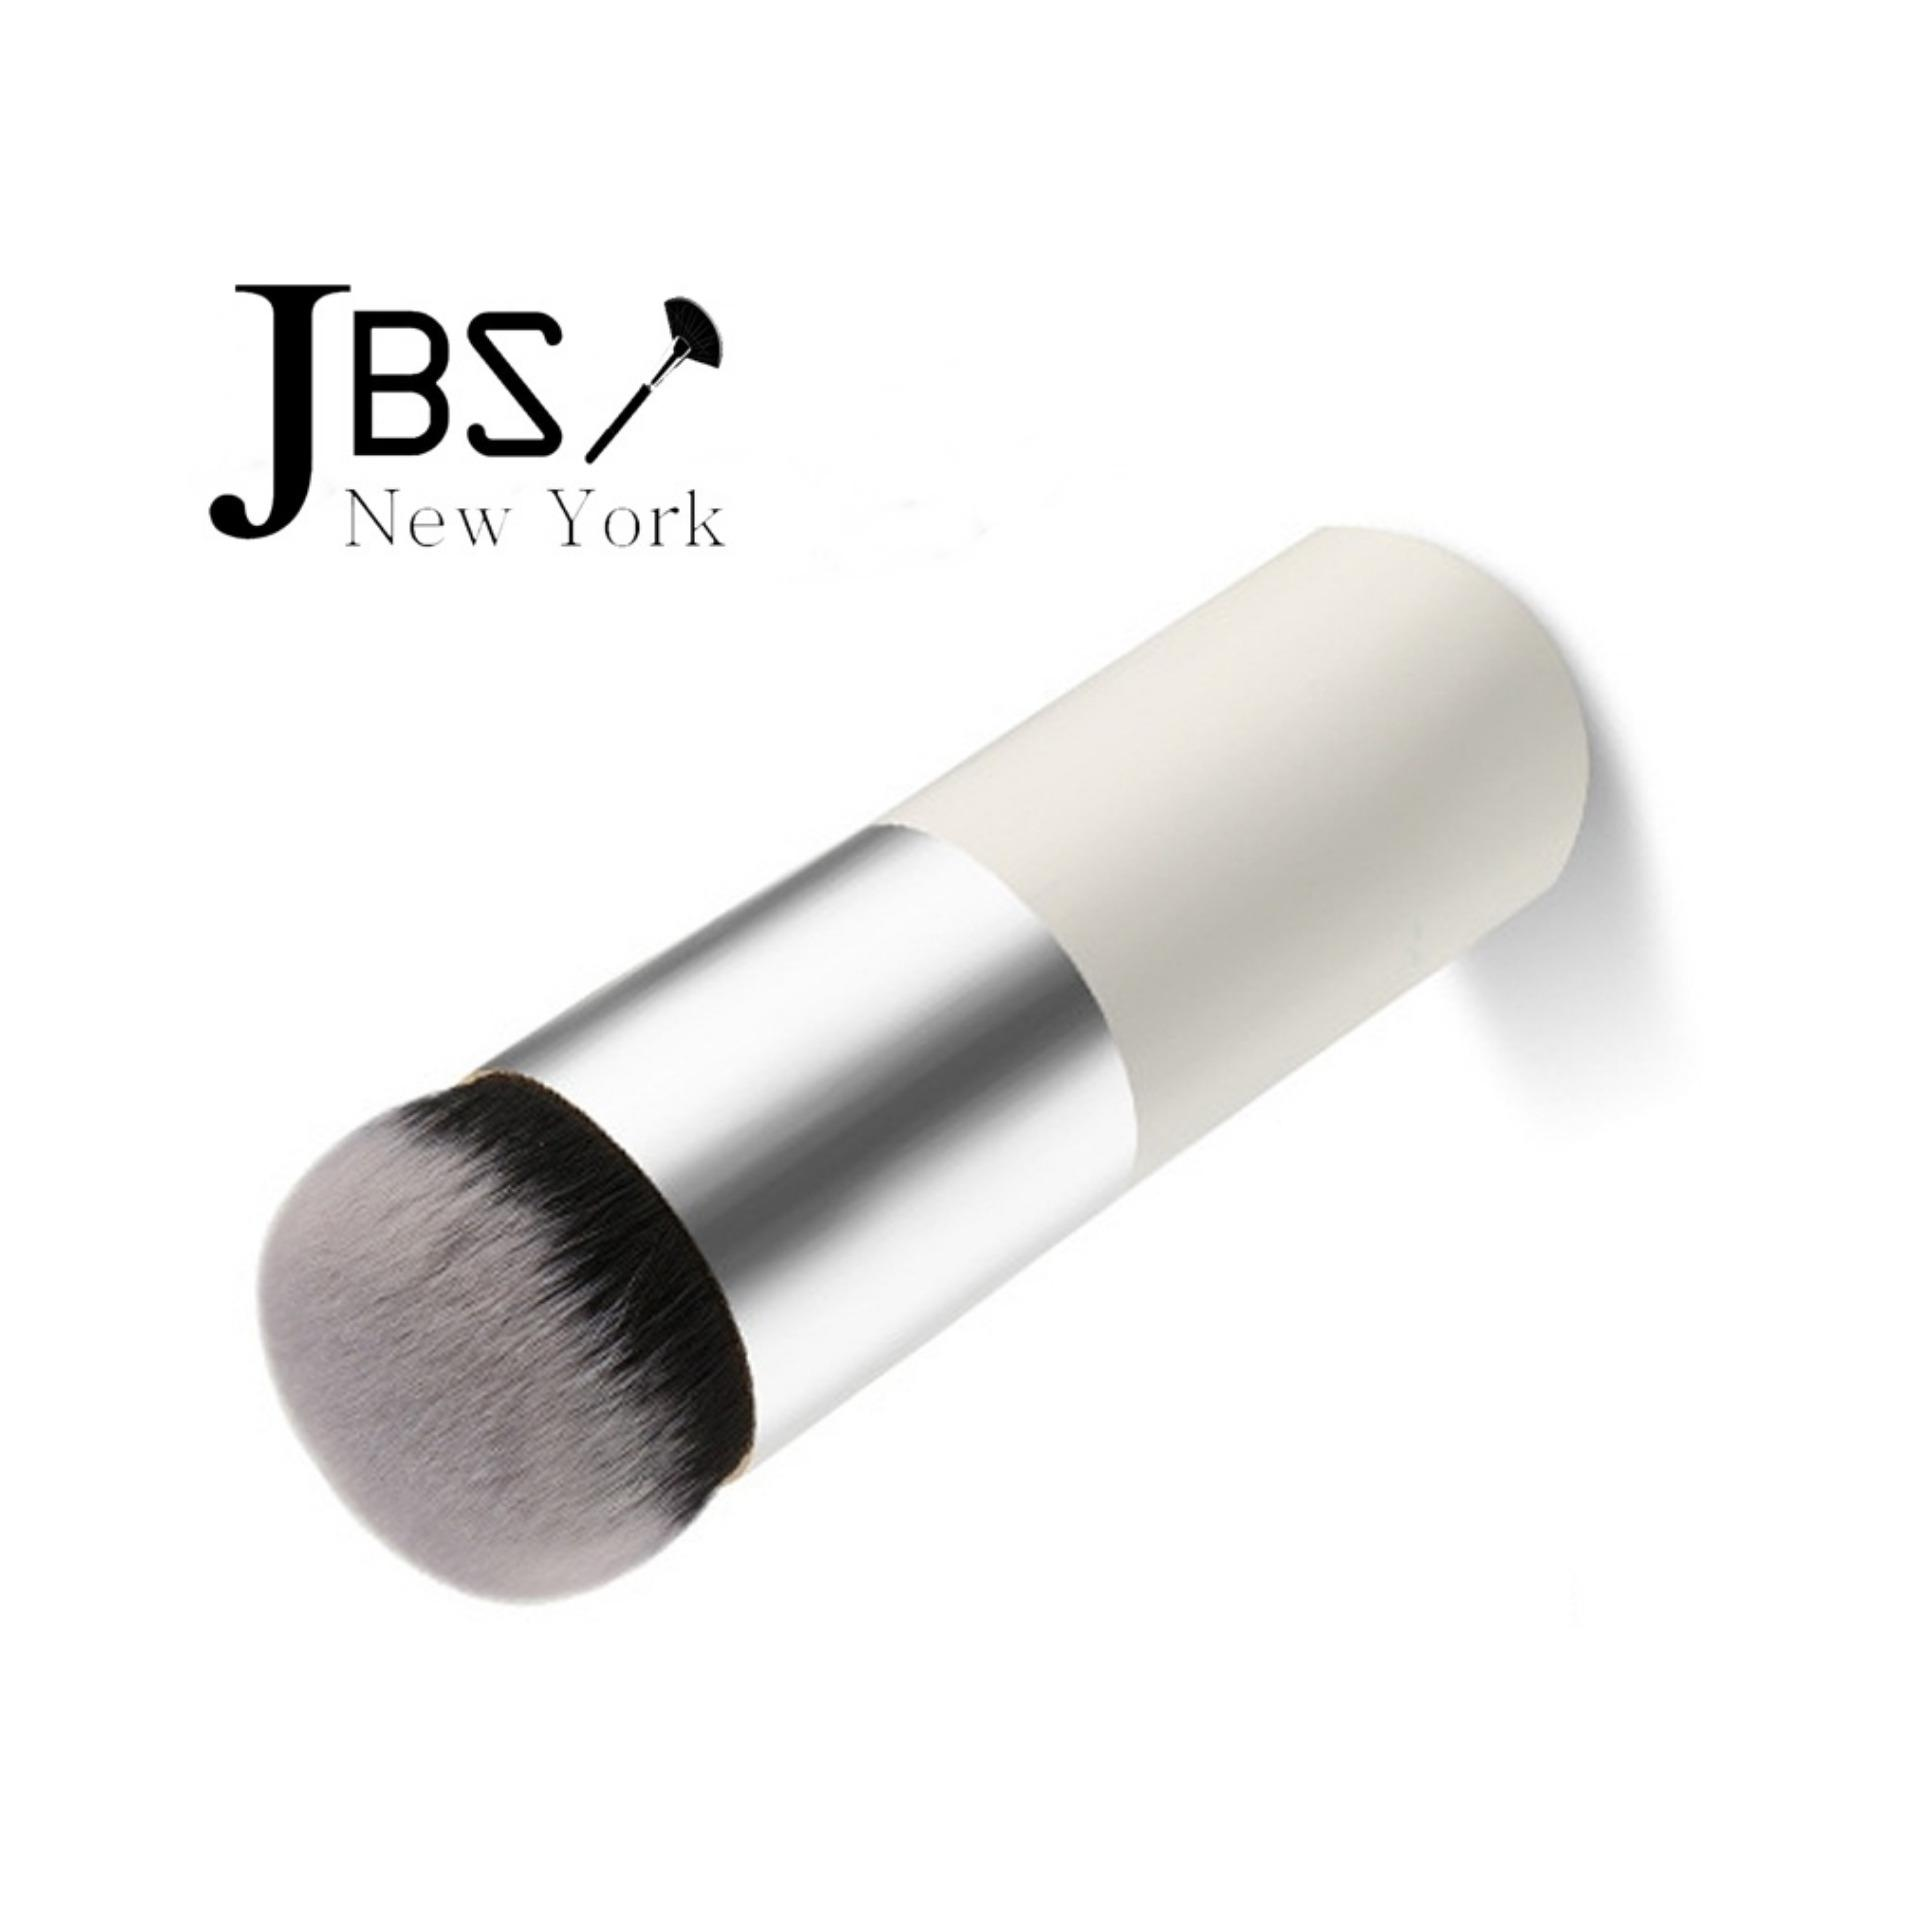 JBS New York makeup brush  / Kuas Make Up chuby pier silver / Kuas Foundation bedak tabur bagian atas datar kosmetik Makeup Brush / K - 019